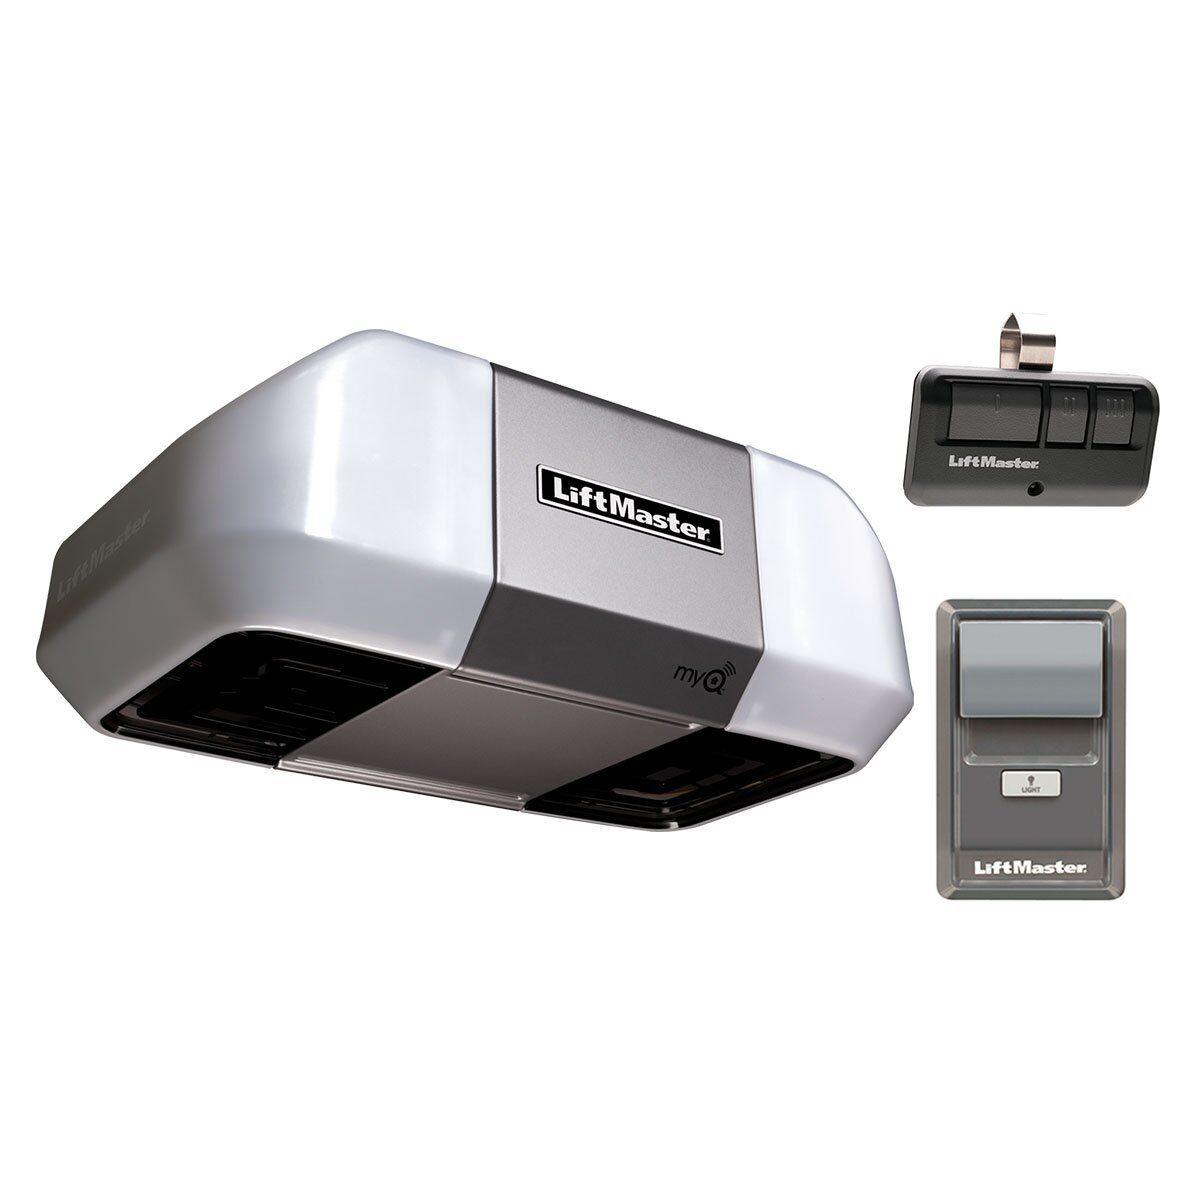 Liftmaster 8355 3280 1 2 Hp Ac Belt Drive Garage Door Make Your Own Beautiful  HD Wallpapers, Images Over 1000+ [ralydesign.ml]